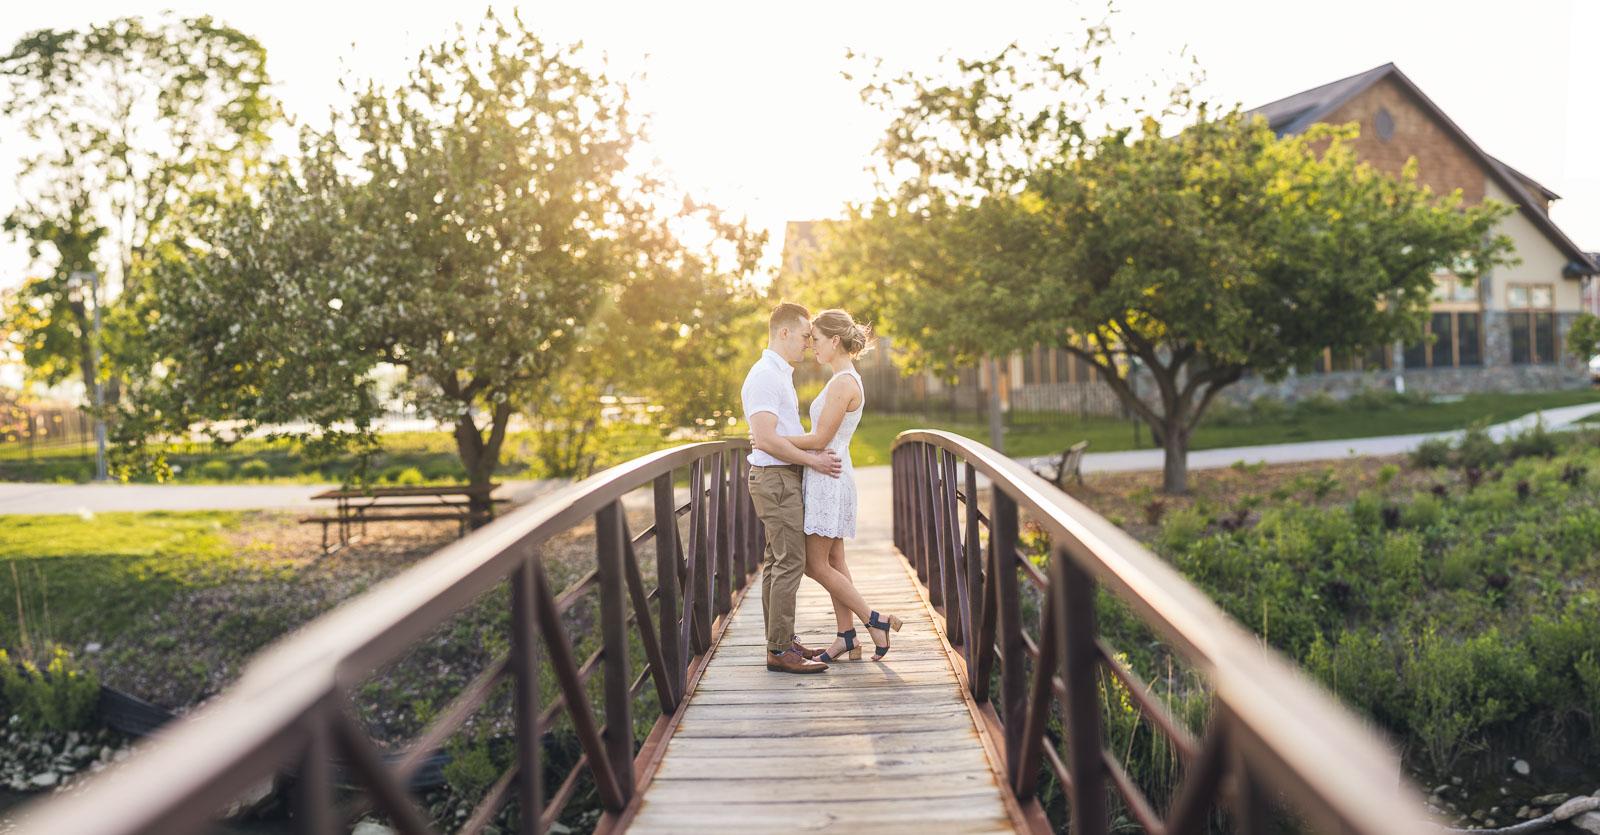 Tarrytown Engagement Photo